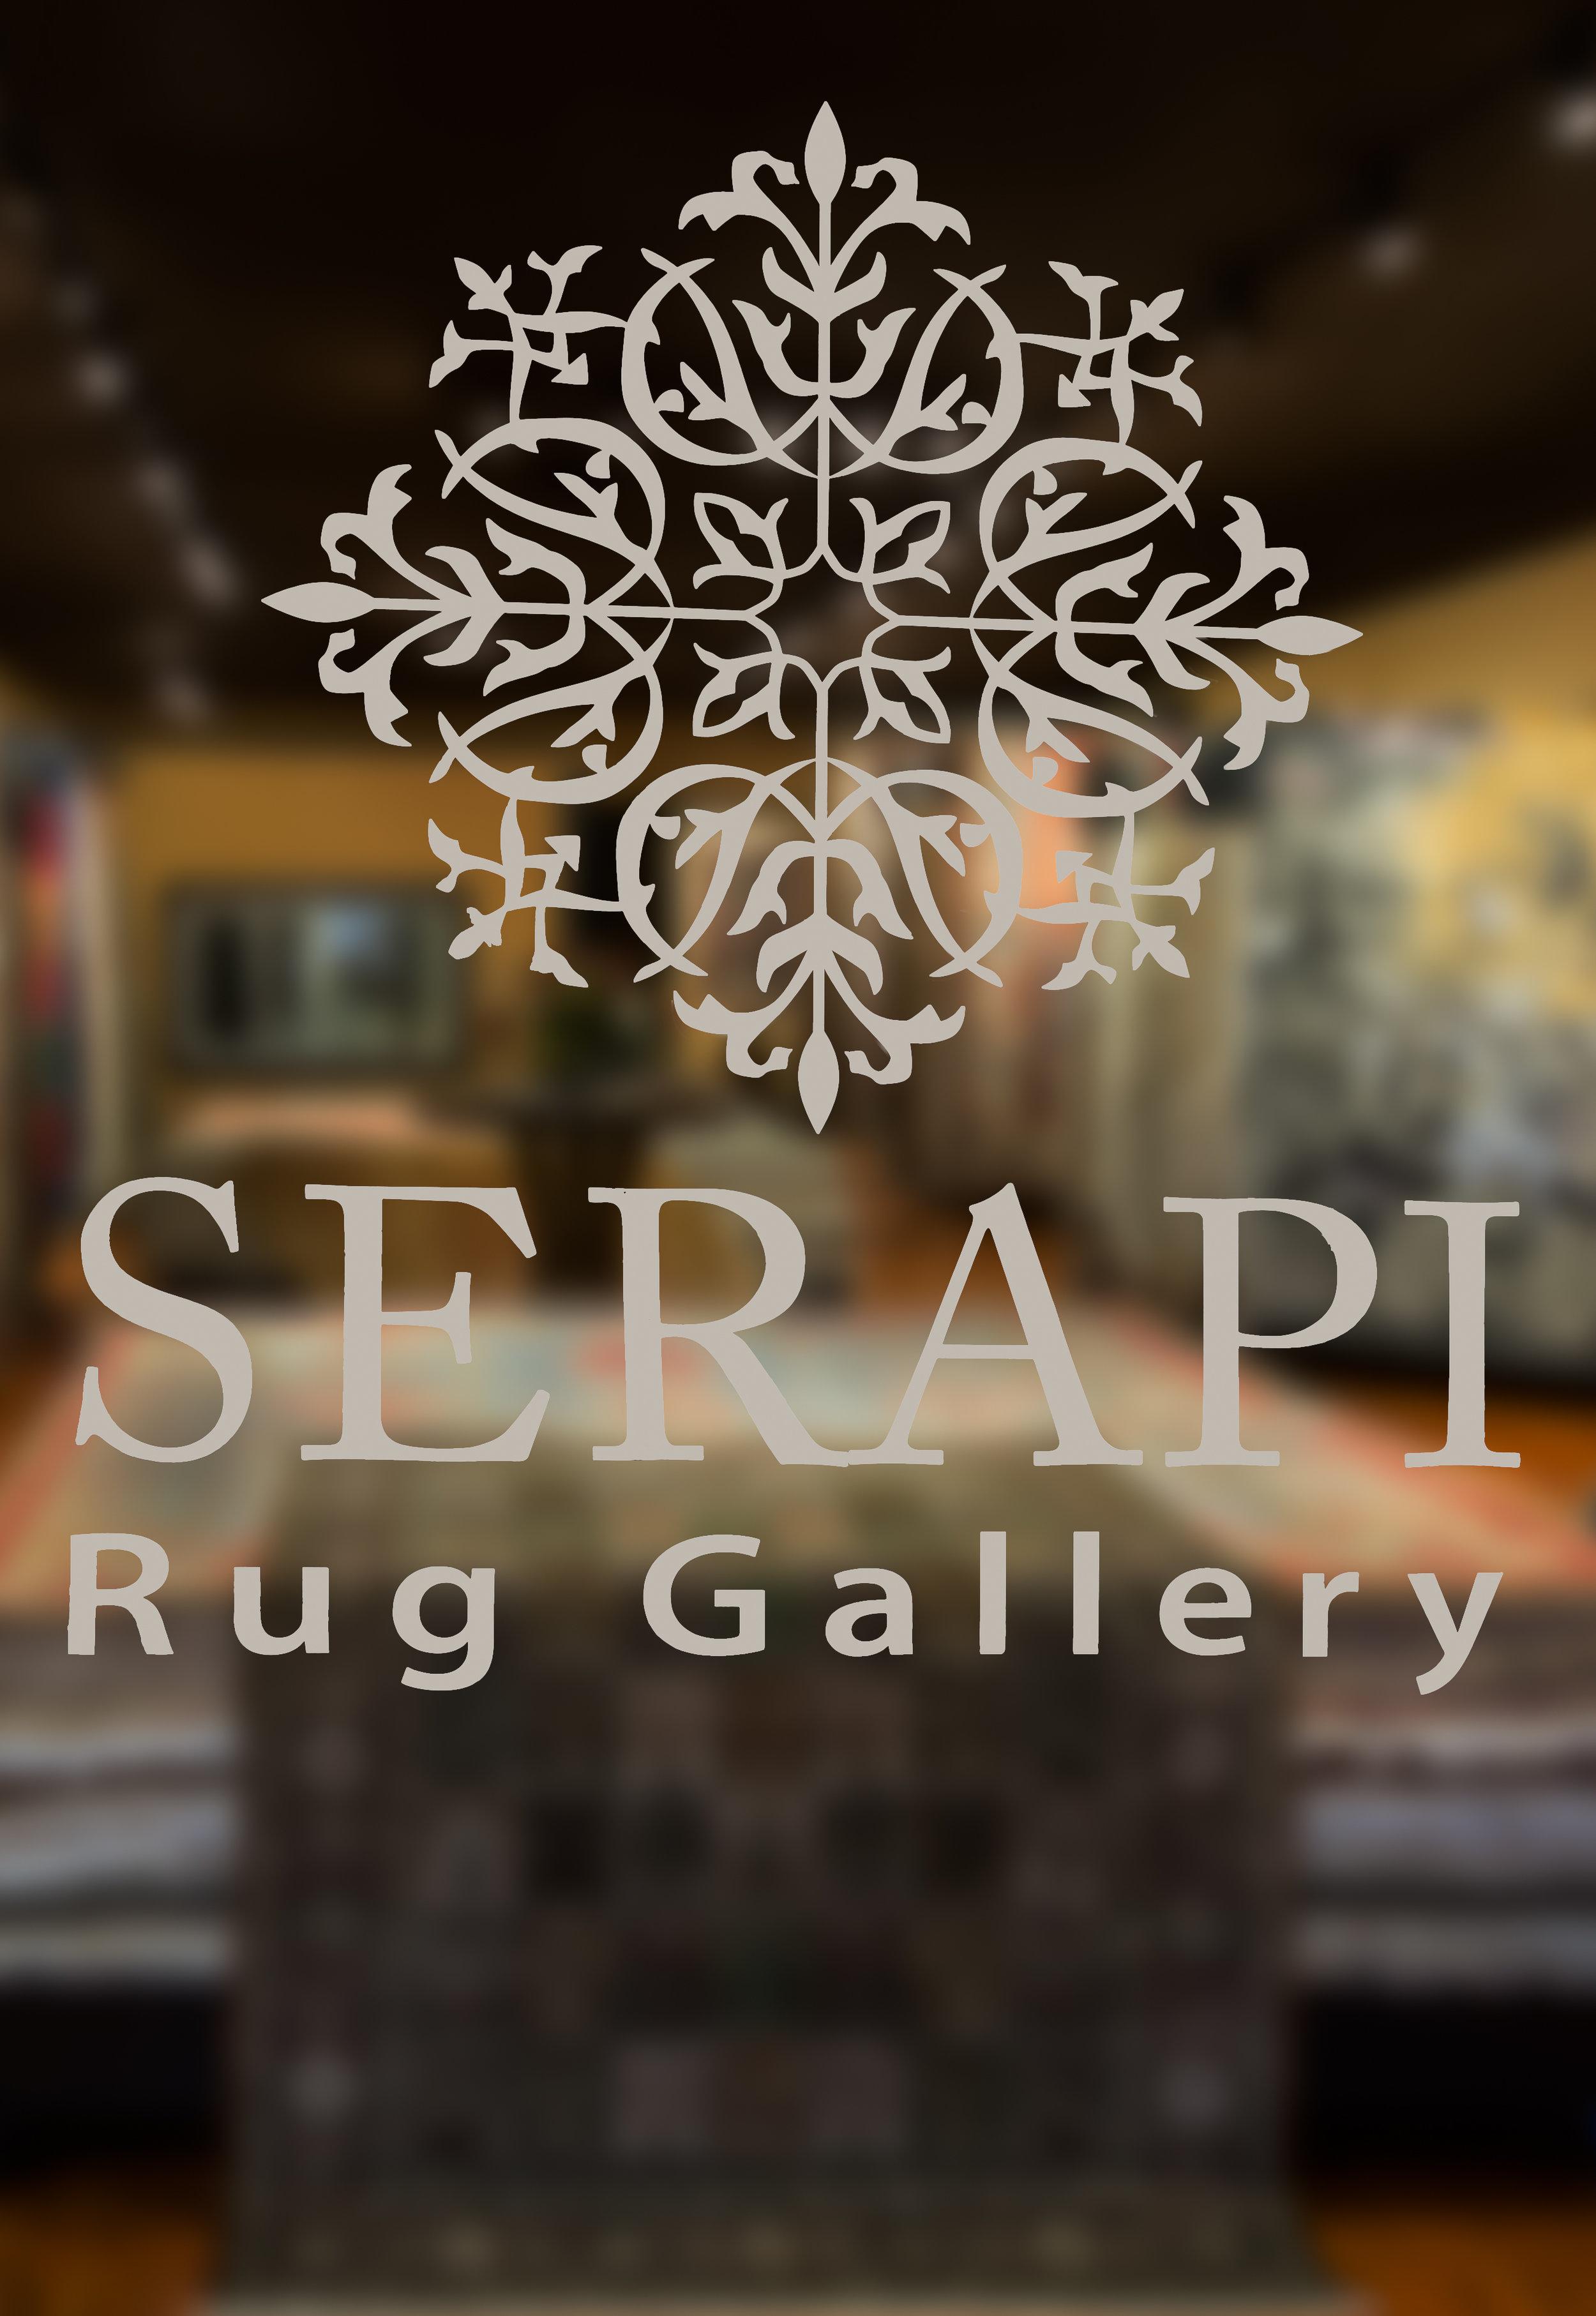 Our Story — Serapi Rug Gallery